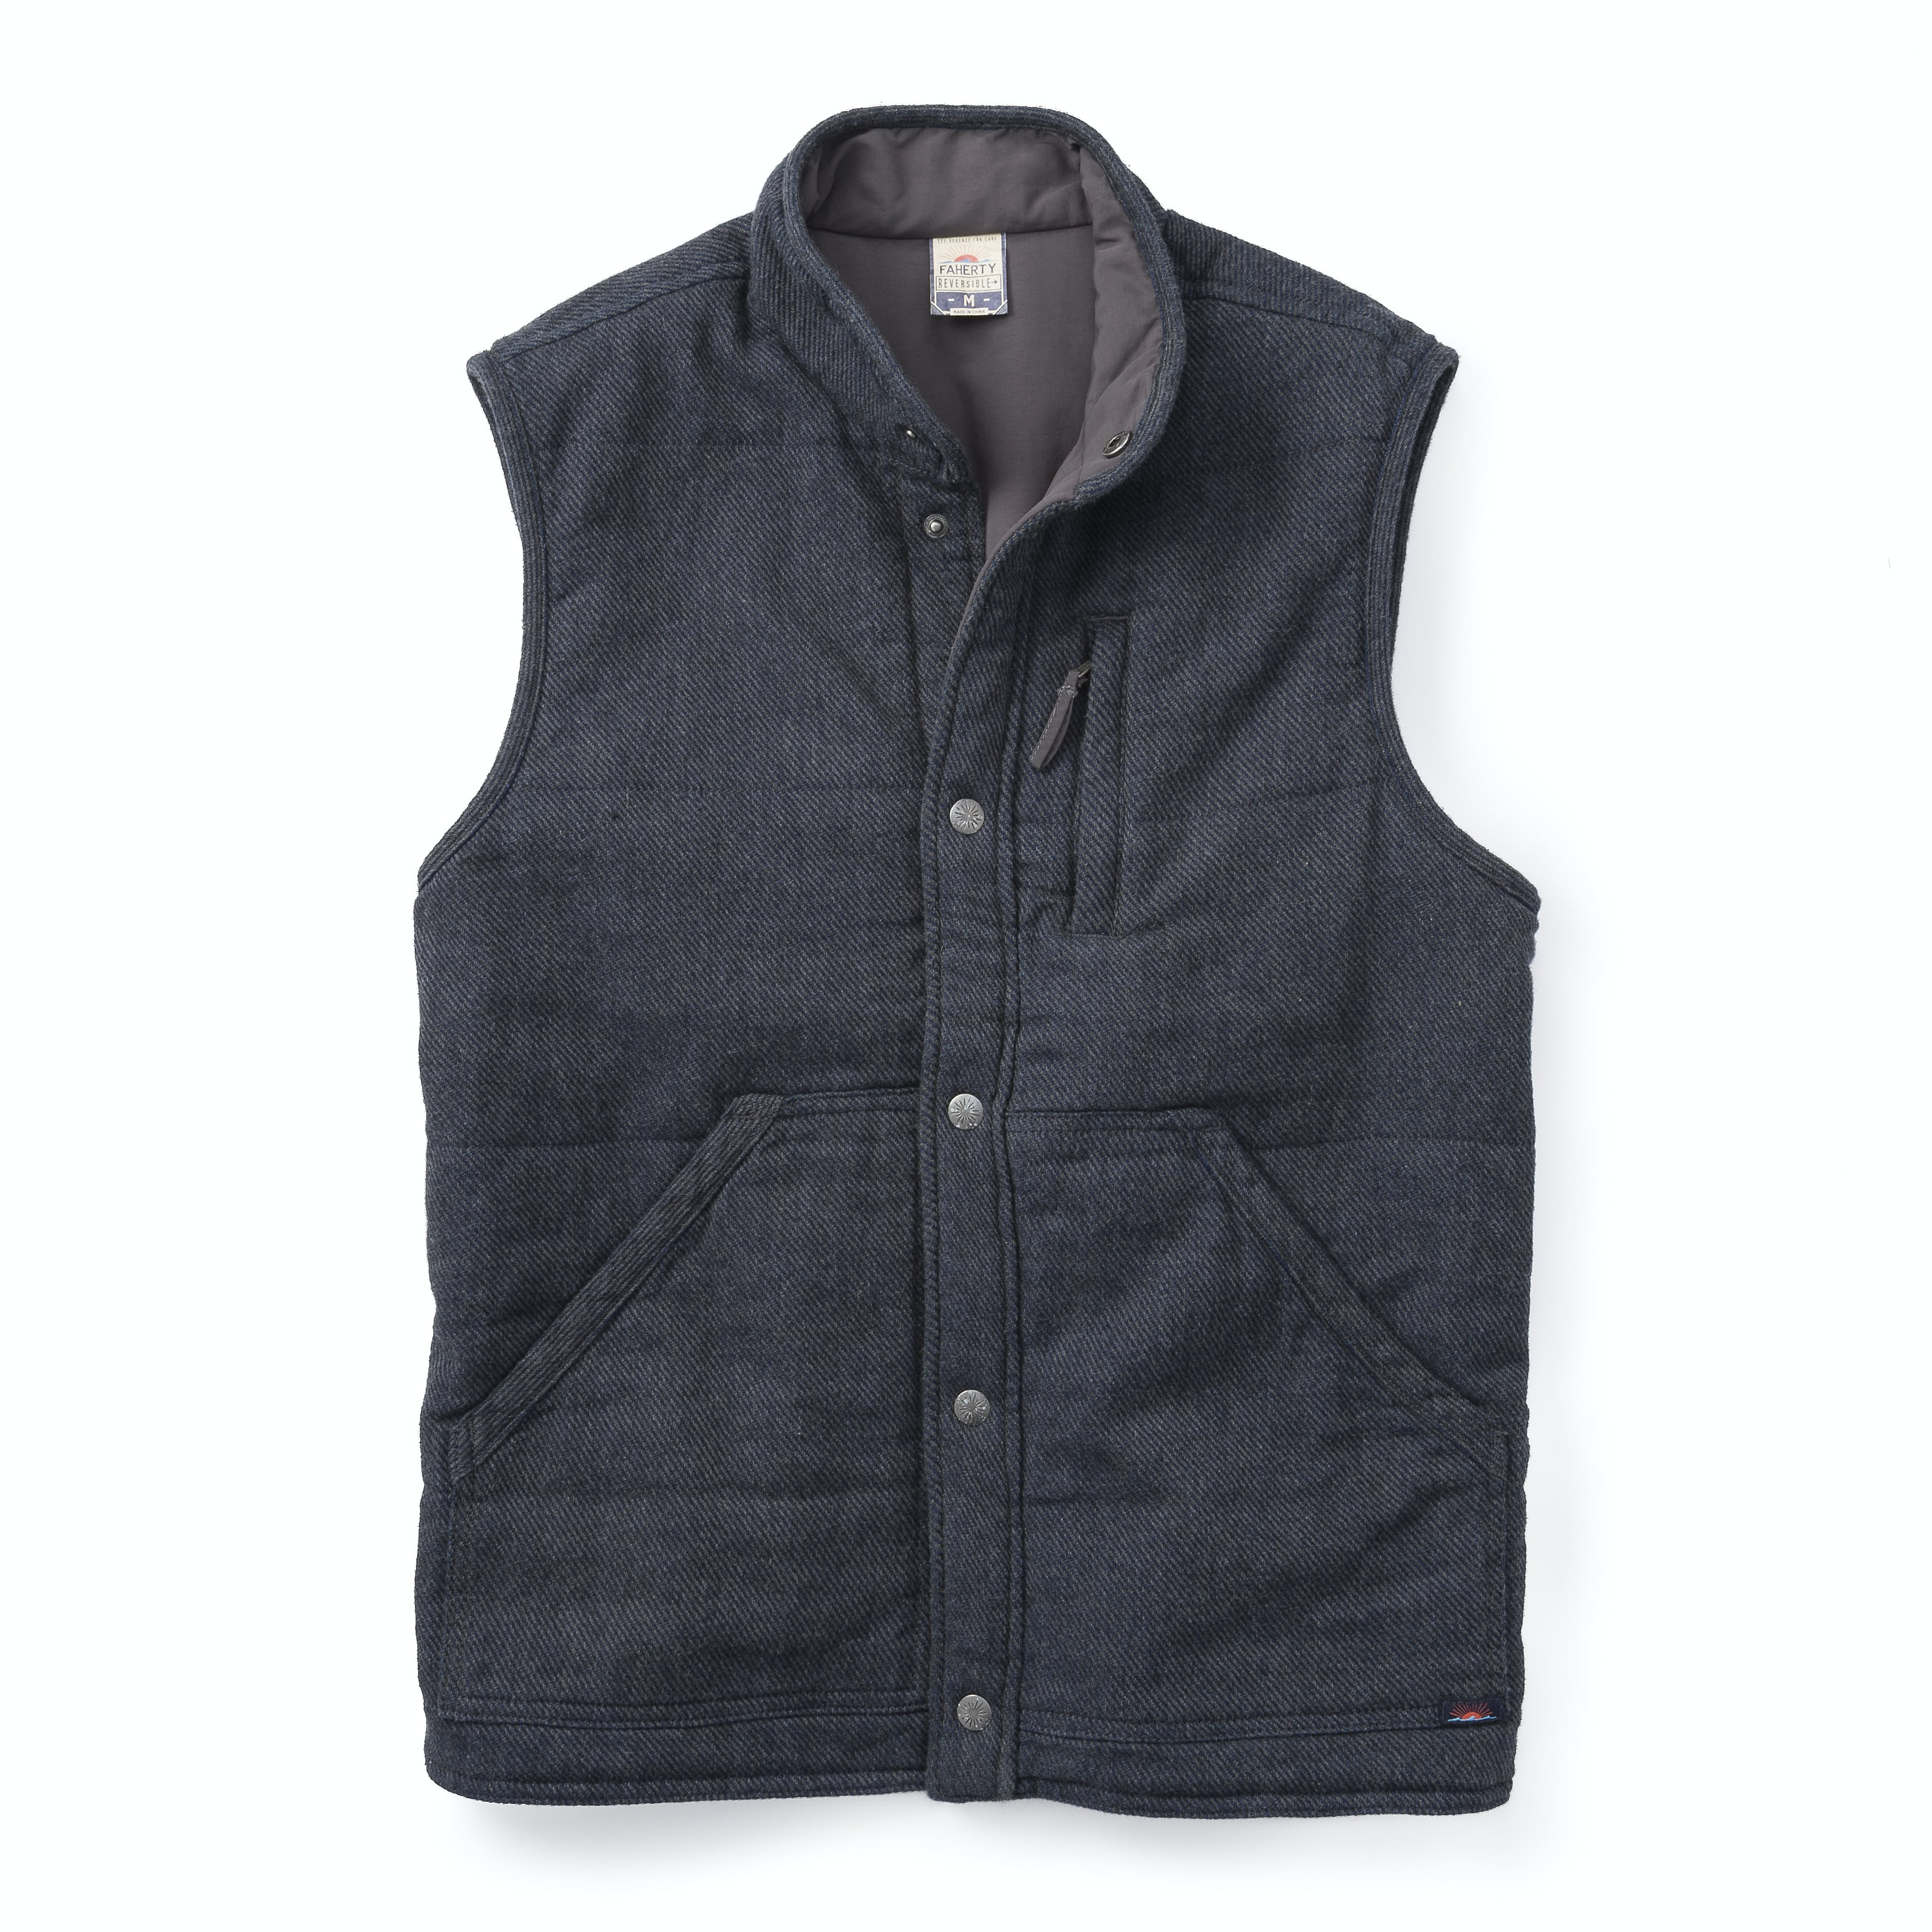 Xl7tiw7evg faherty brand reversible cherry creek vest 0 original